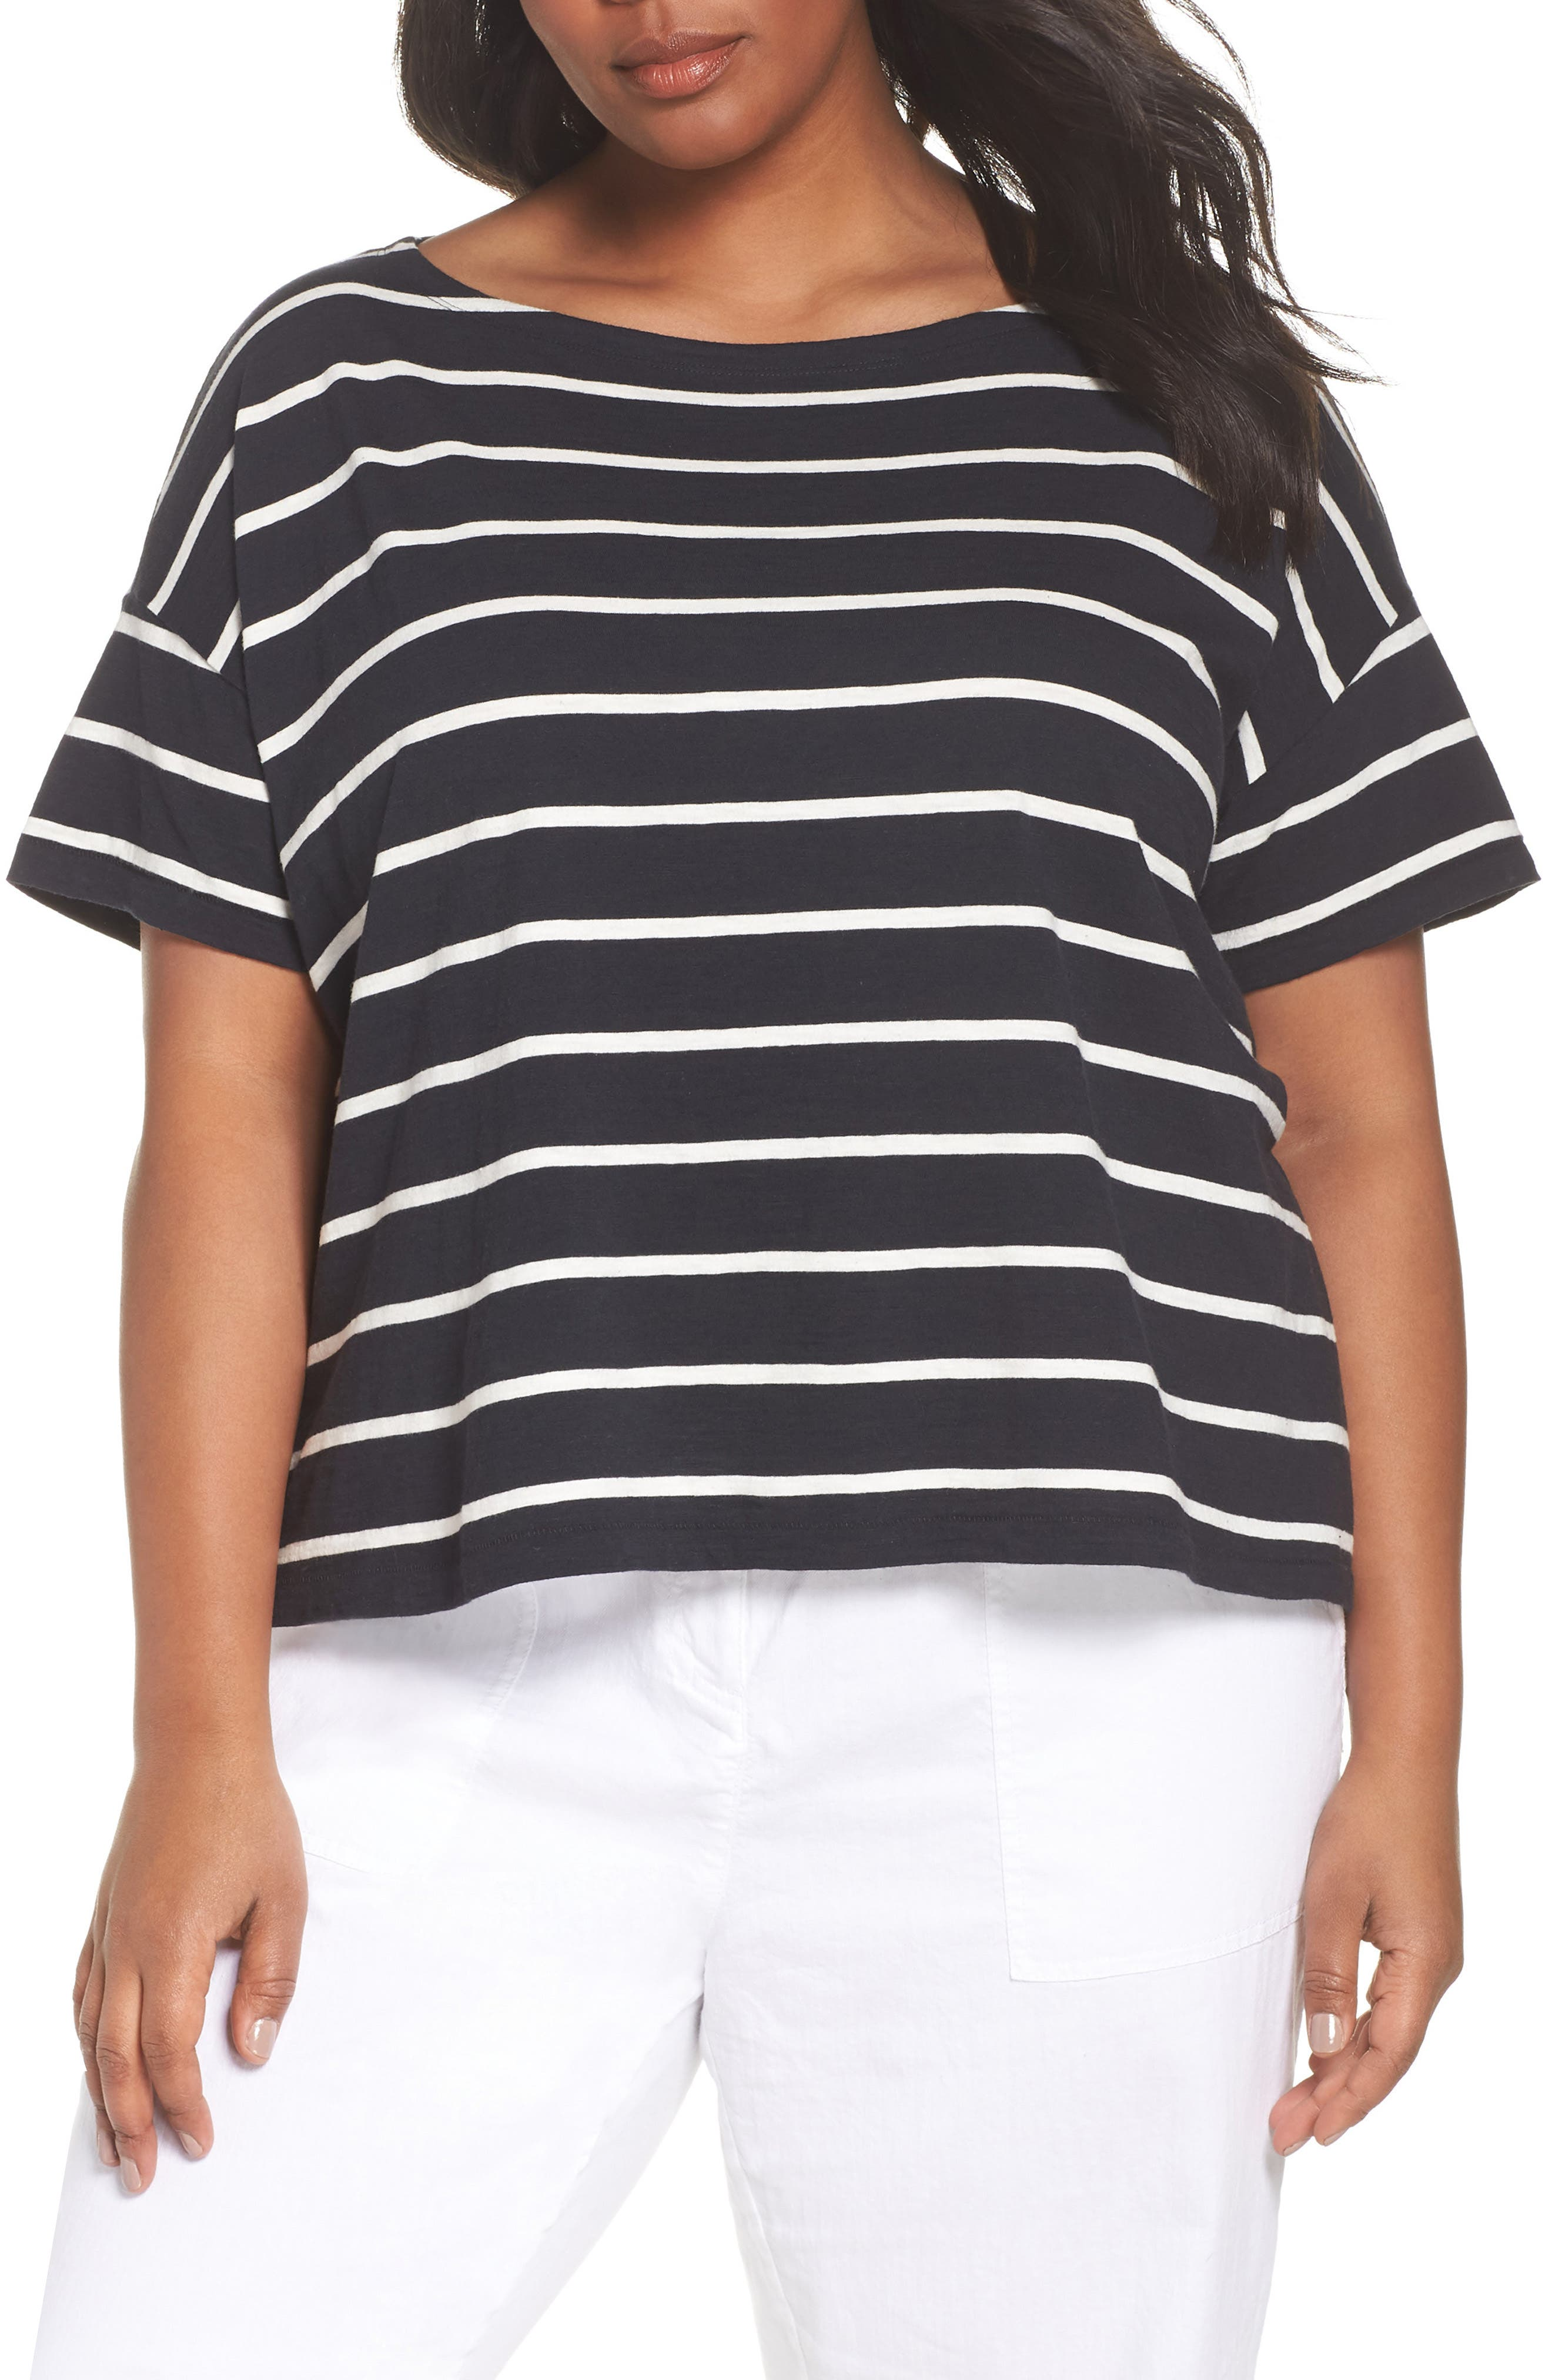 Stripe Organic Cotton Top,                             Main thumbnail 1, color,                             Black/ White